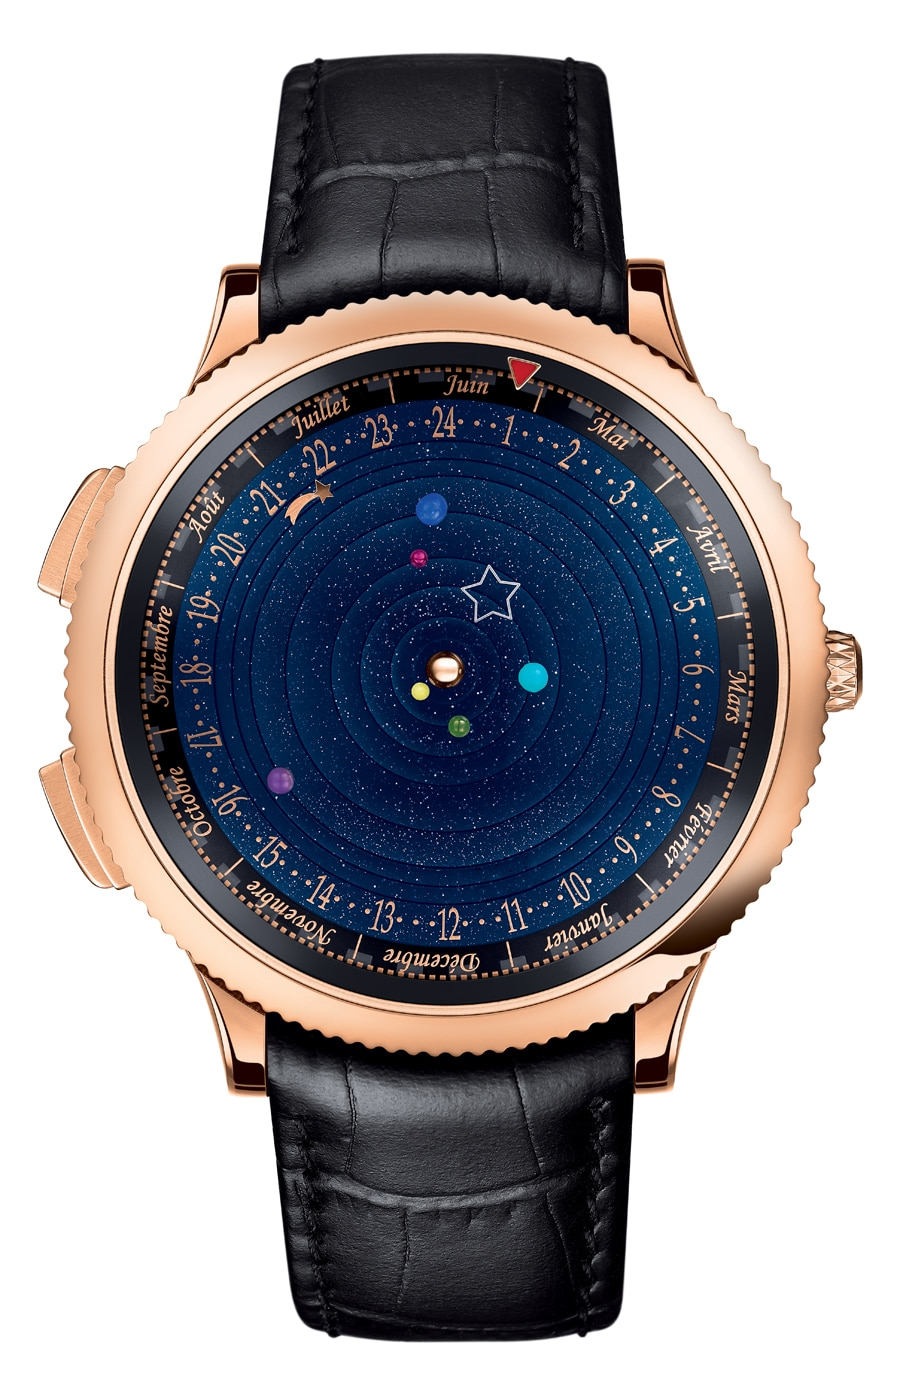 Van Cleef & Arpels: Midnight Planétarium